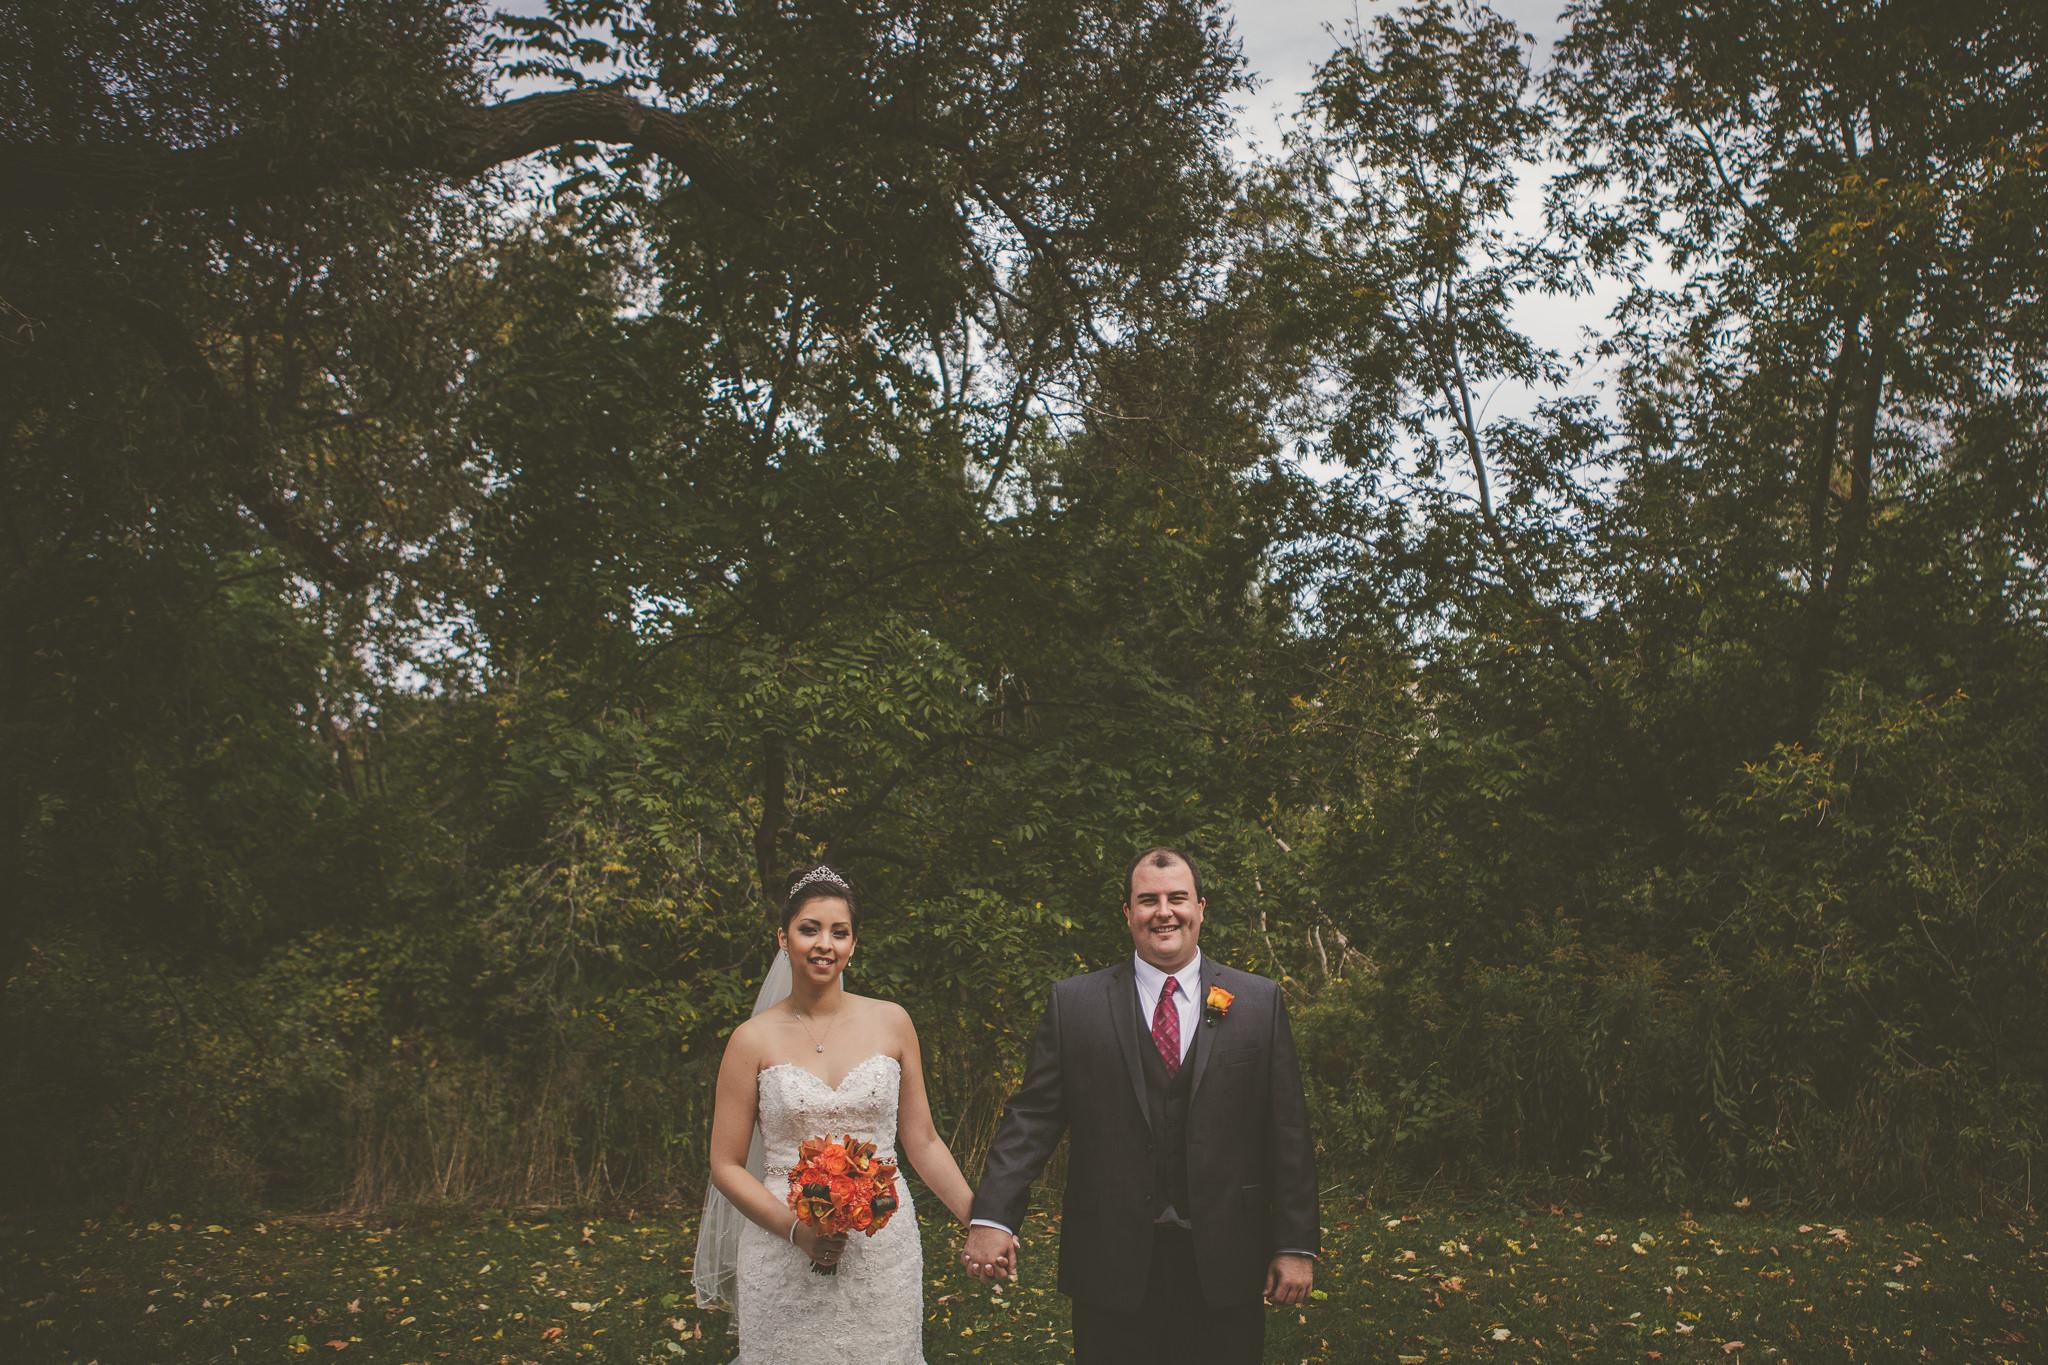 deer creek banquet facility wedding photos 220 - Deer Creek Wedding Photos